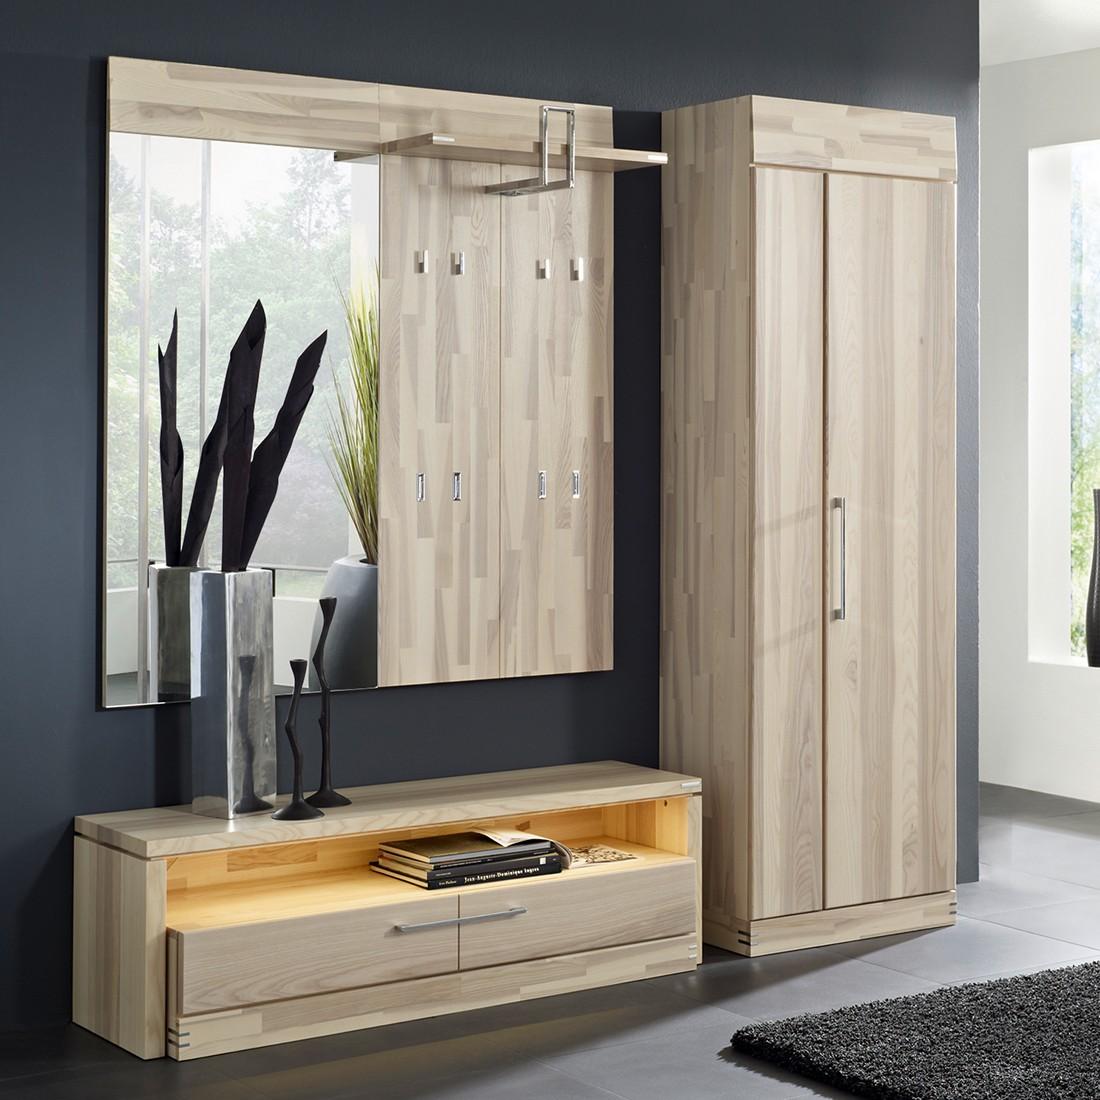 garderobenset terra i 4 teilig mit beleuchtung kernesche massiv. Black Bedroom Furniture Sets. Home Design Ideas